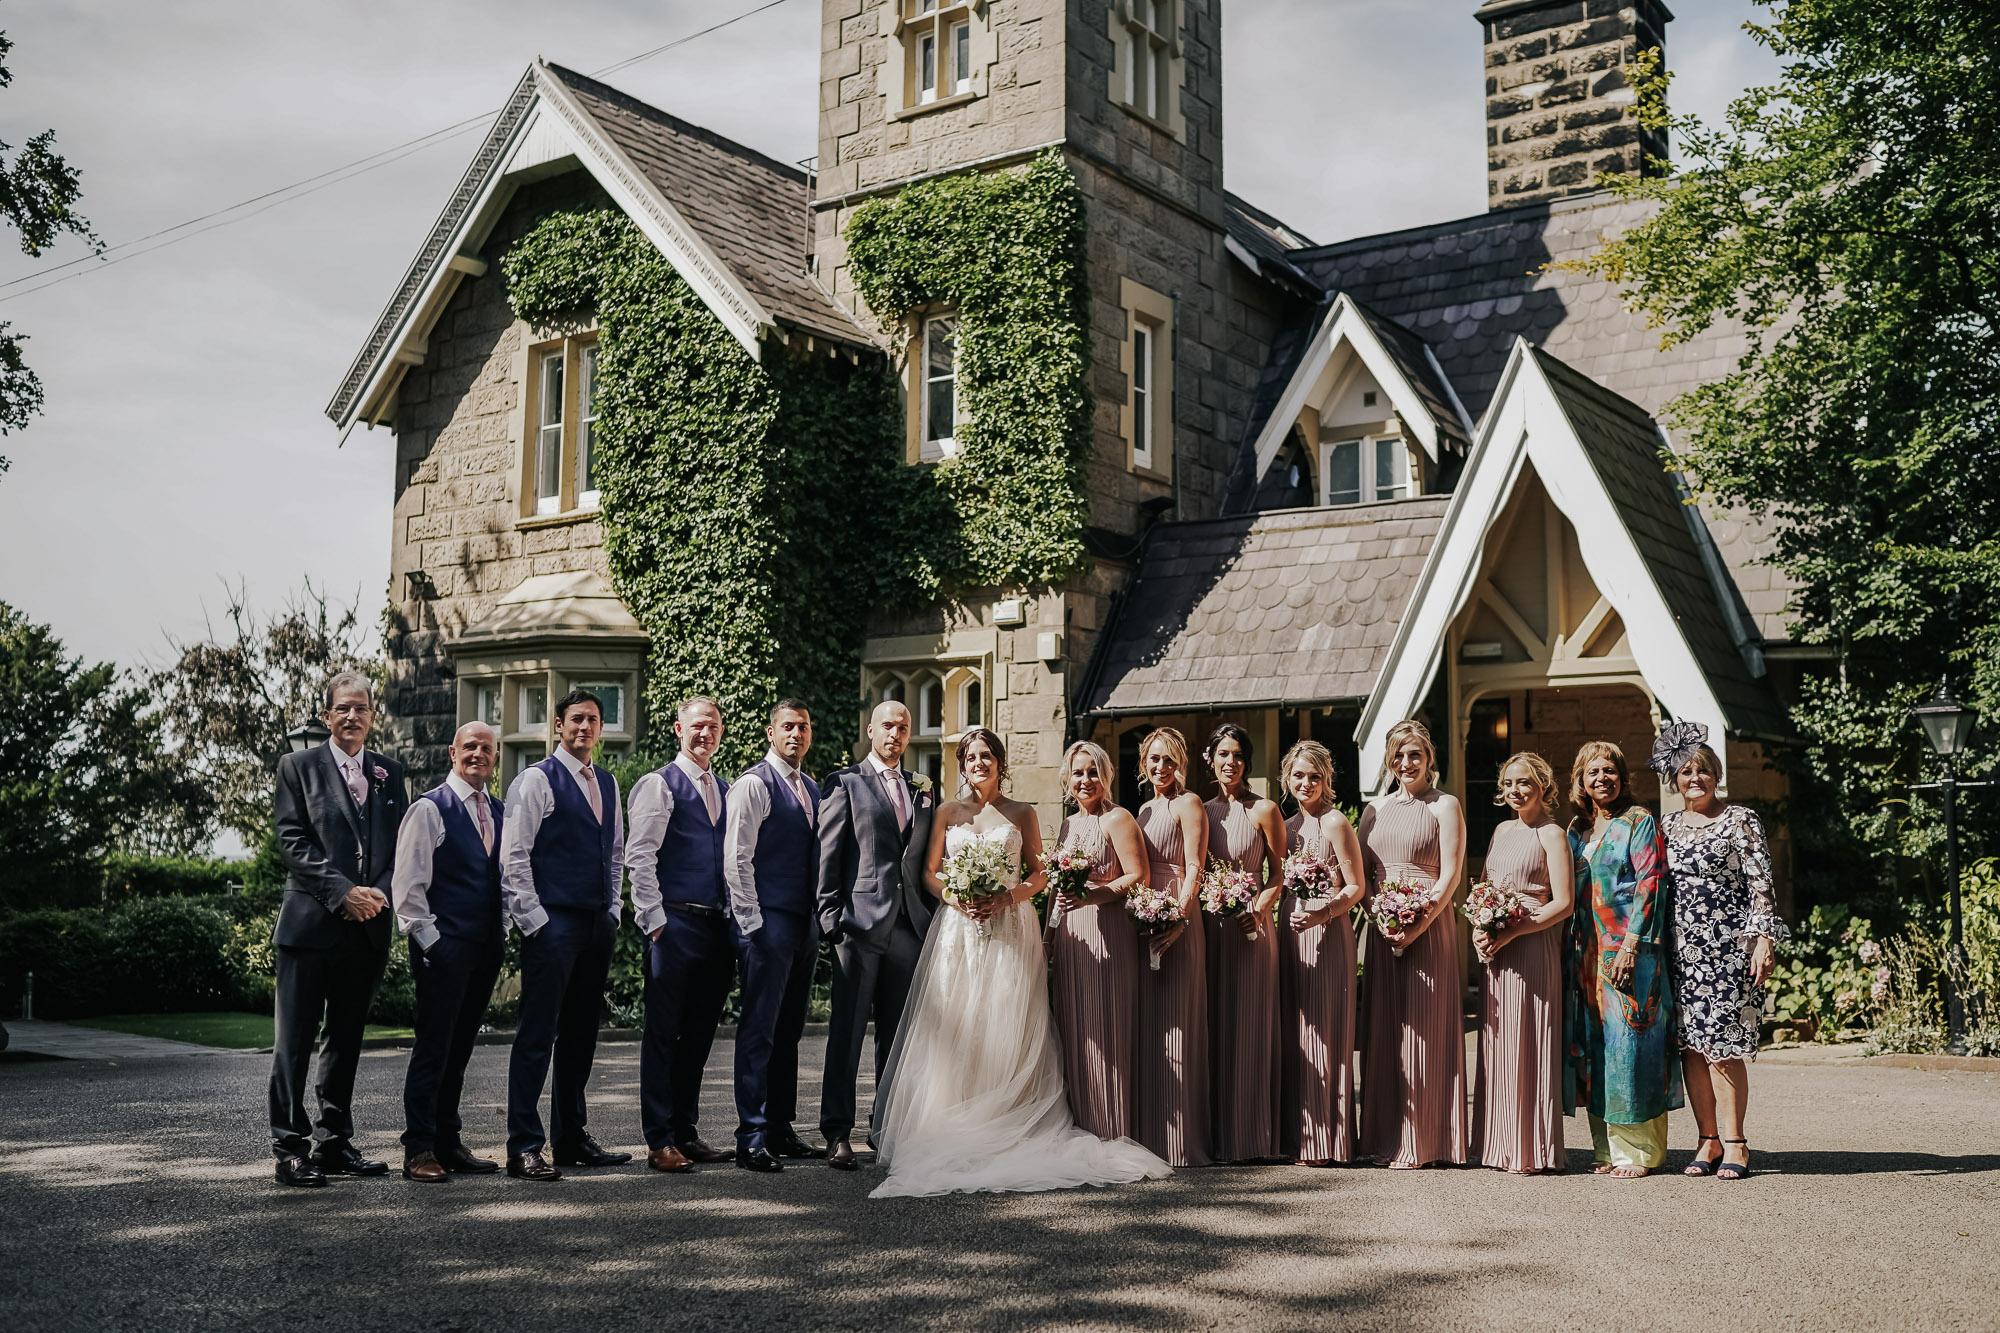 West Tower Wedding Venue Orkskirk Lancashire Wedding Photography cheshire wedding photographer (22 of 47).jpg